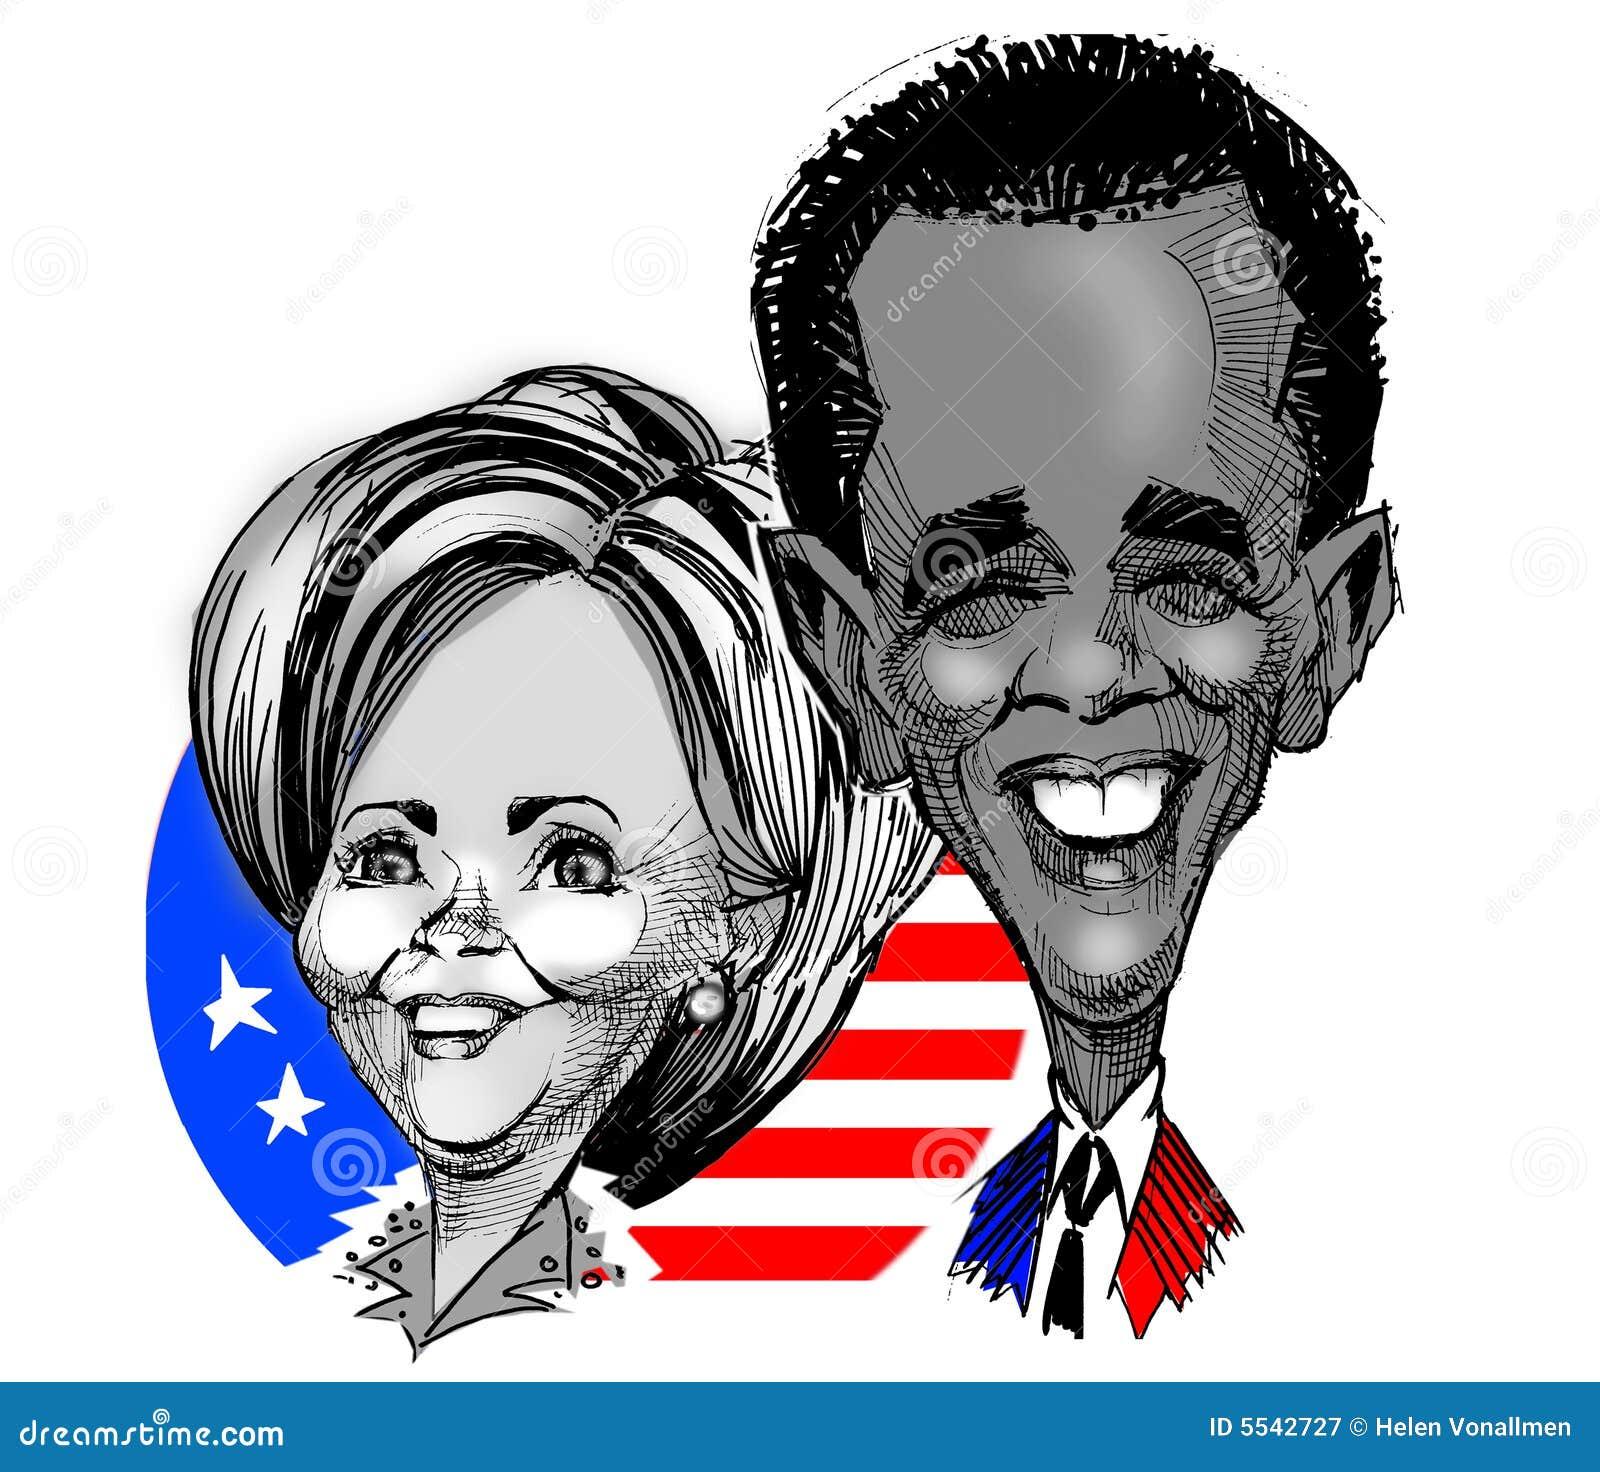 Caricatures - Clinton / Obama